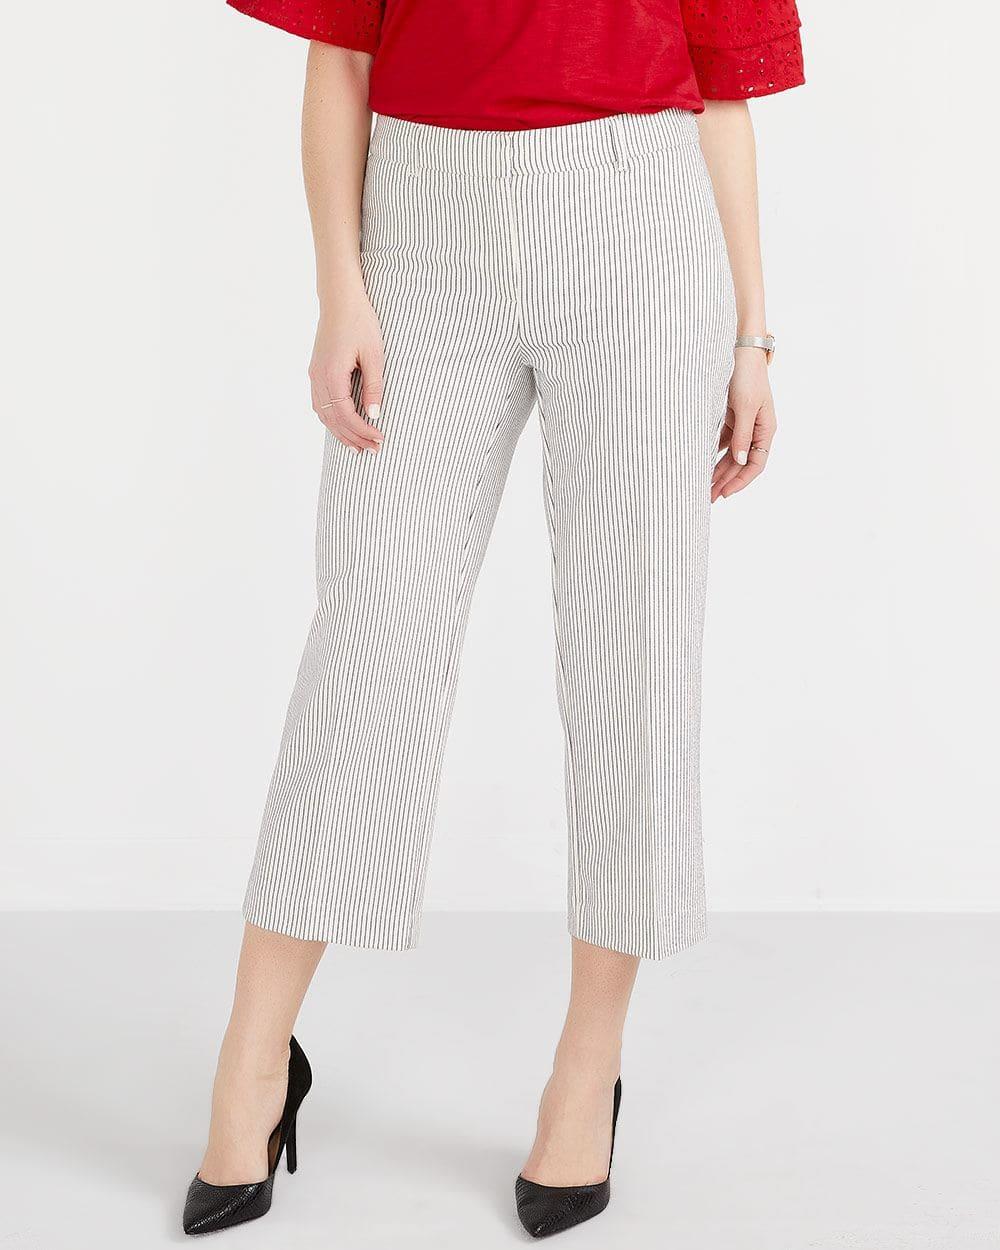 Seersucker Cropped Pants